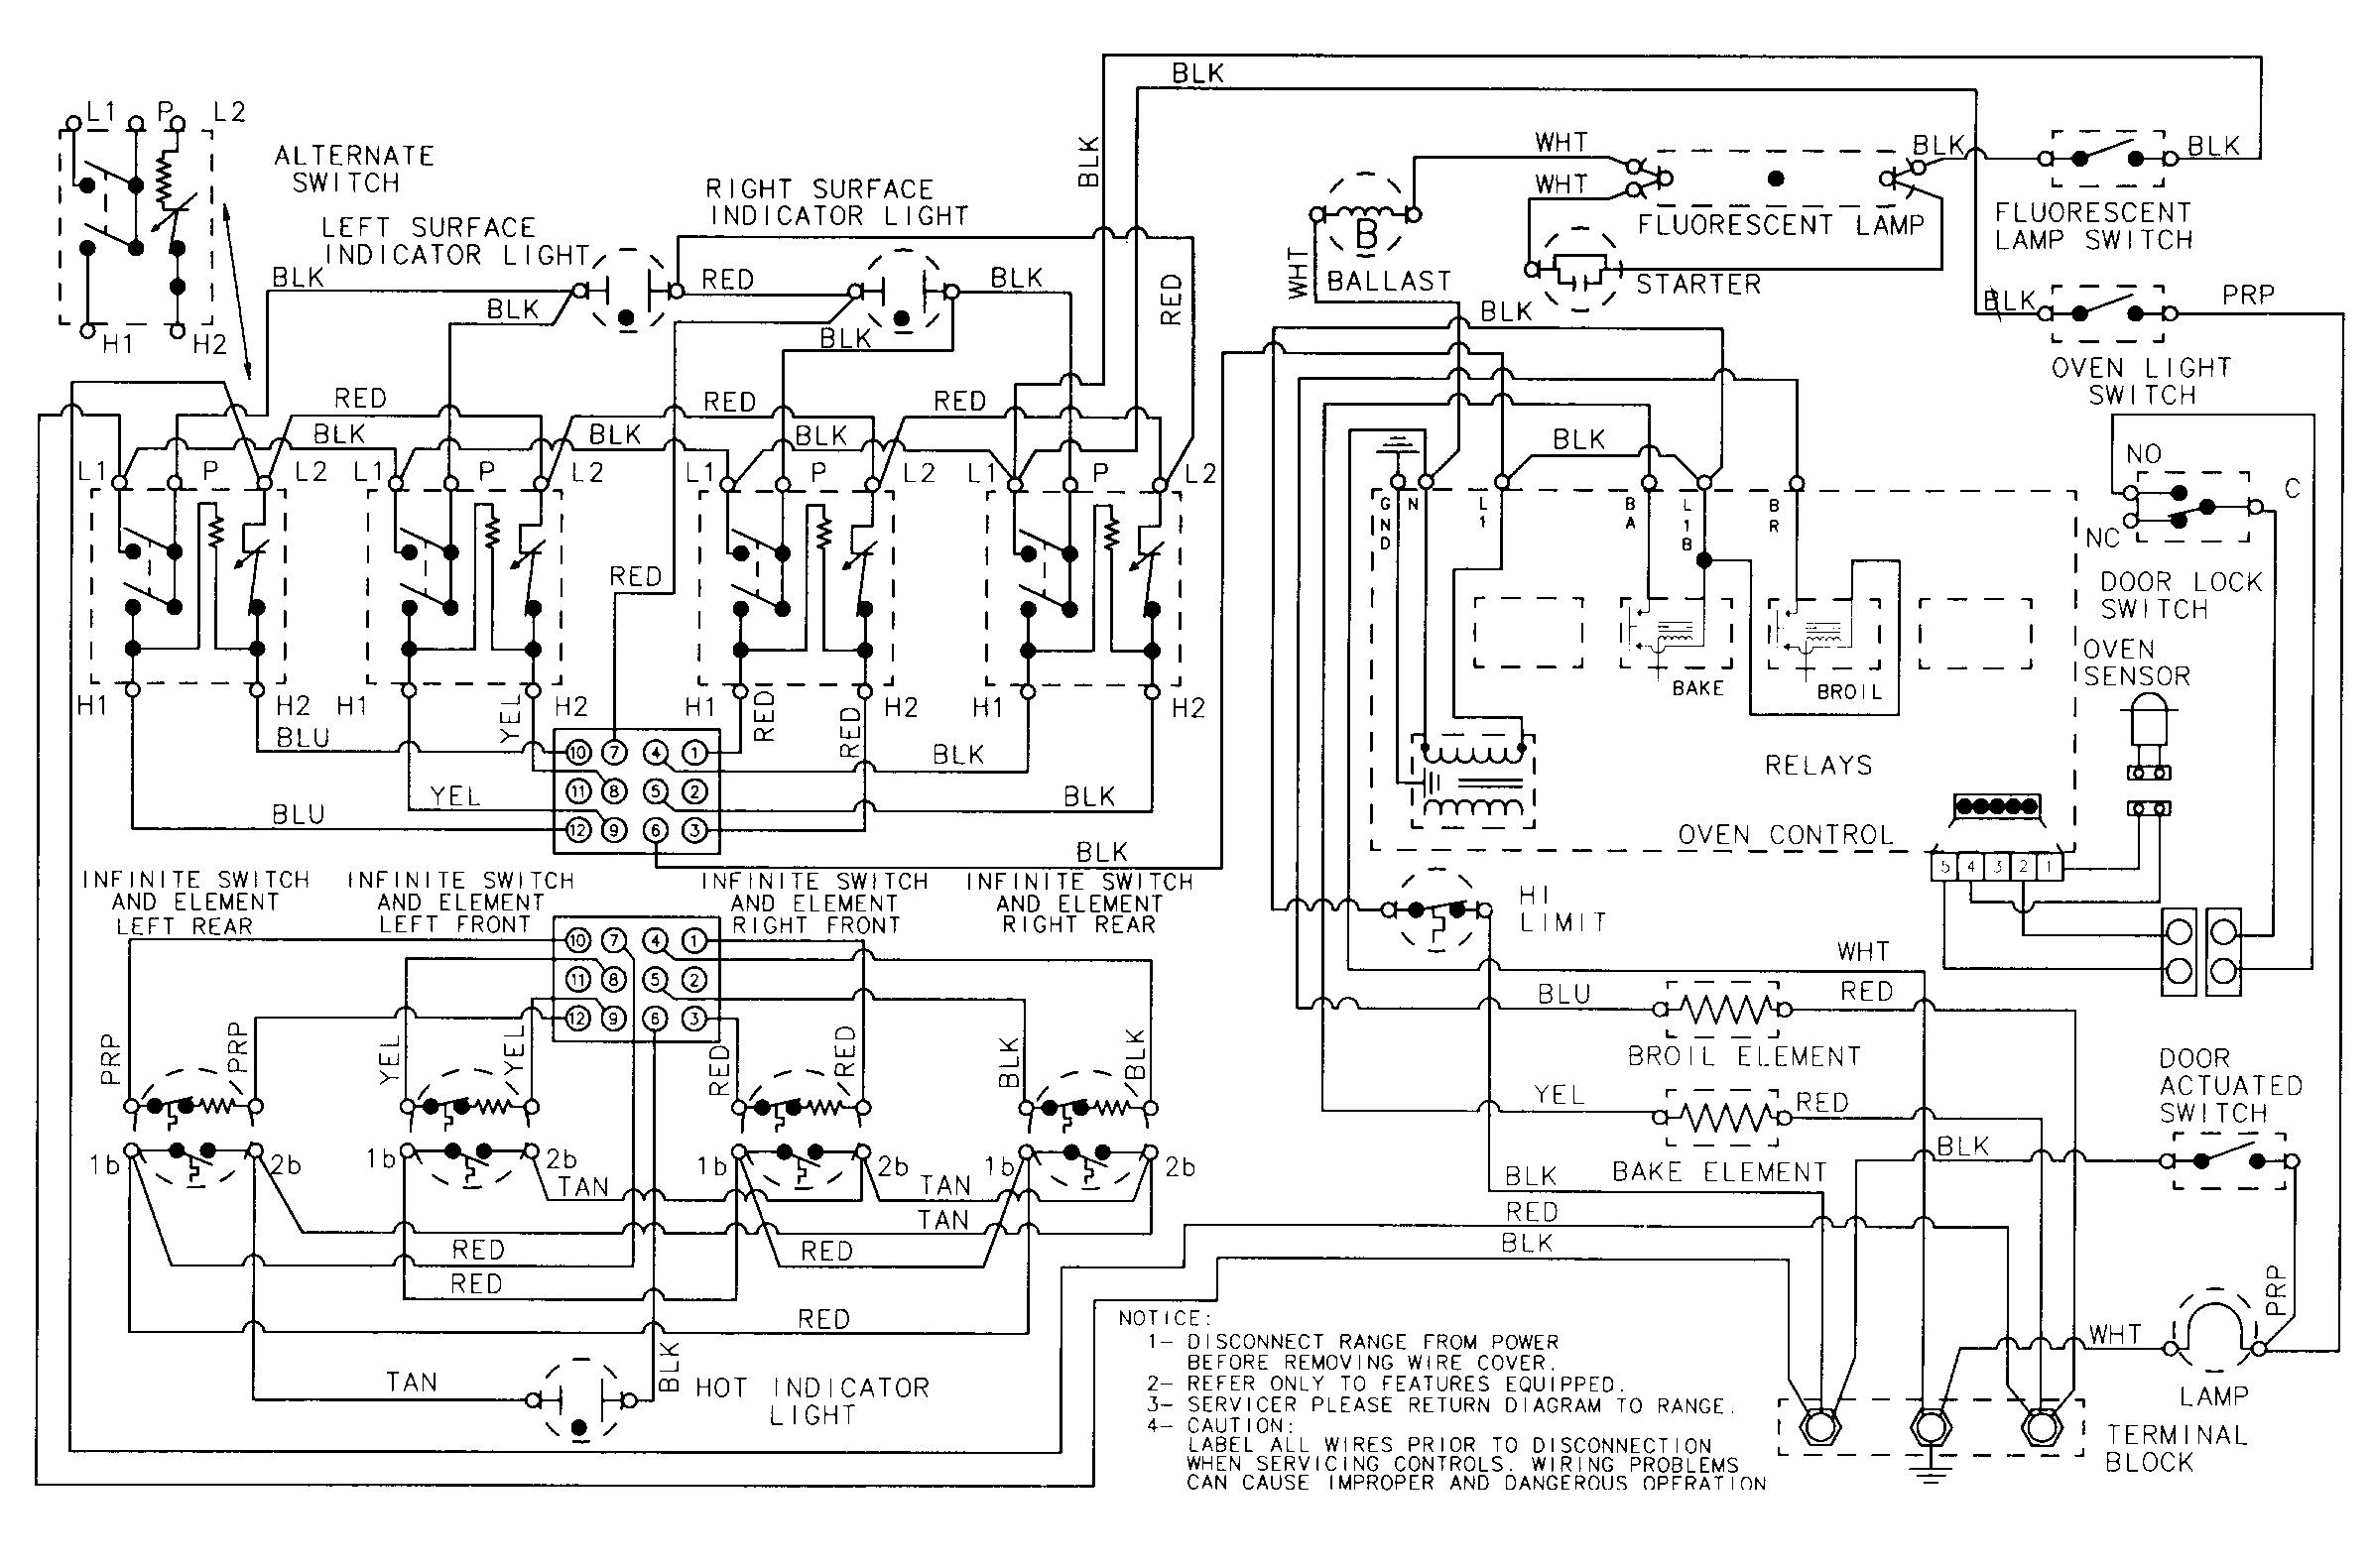 Kitchenaid Superba Oven Owners Manual Wiring Diagram